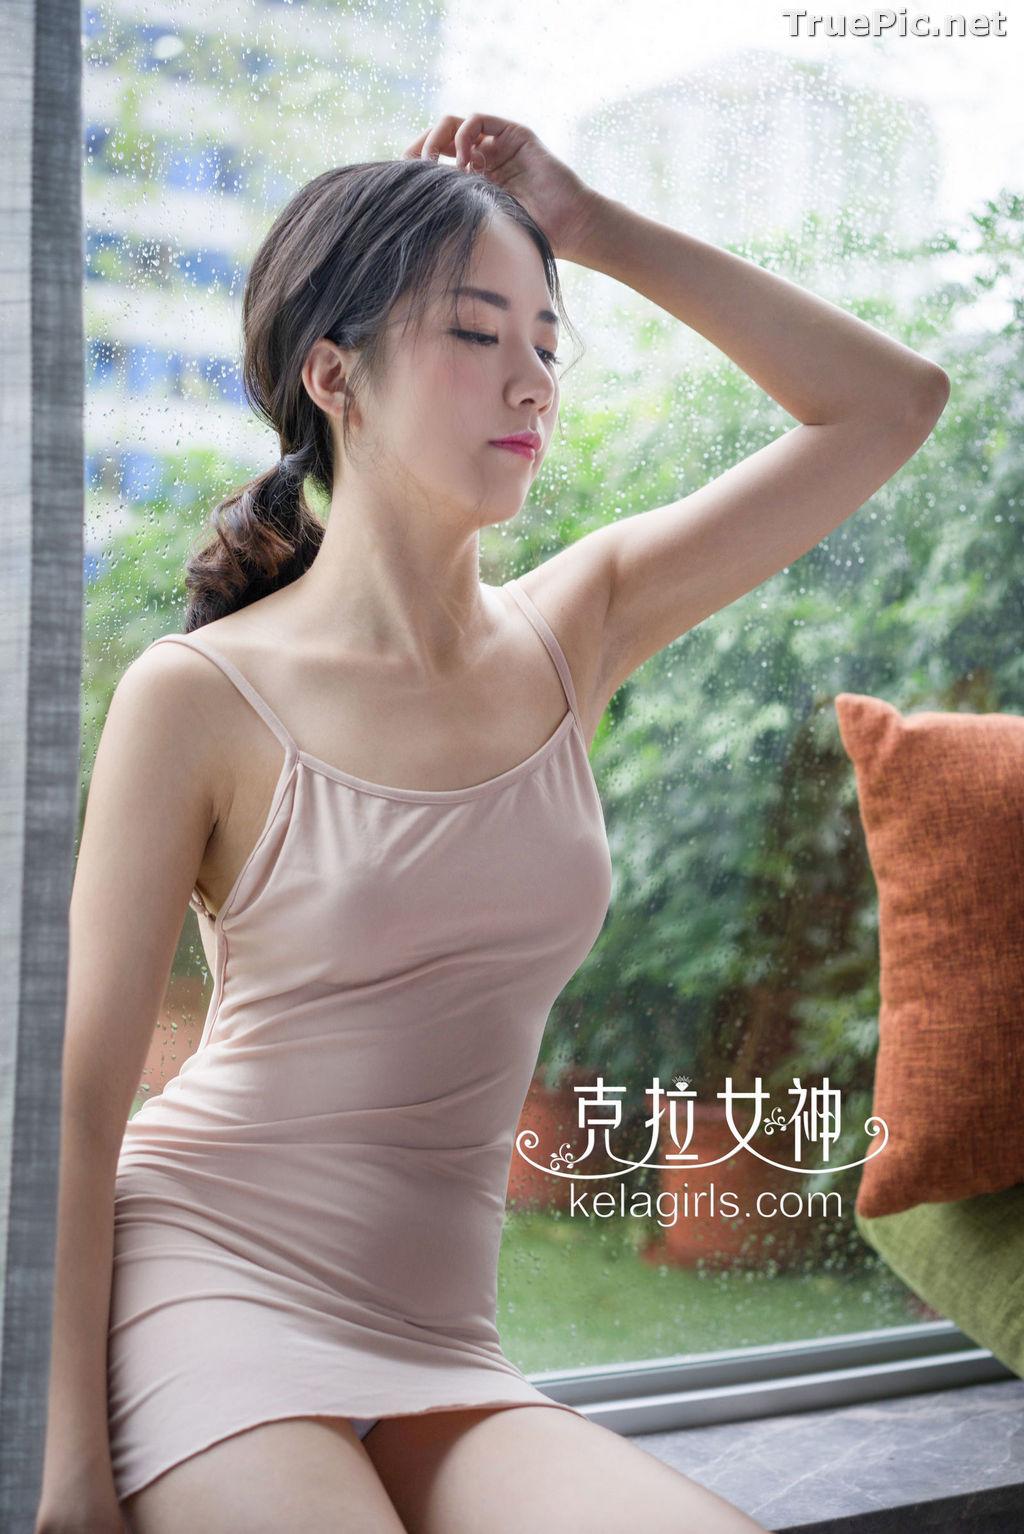 Image KelaGirls 克拉女神 – Chinese Model Ning Ning – Home School Girl Photo Album - TruePic.net - Picture-4